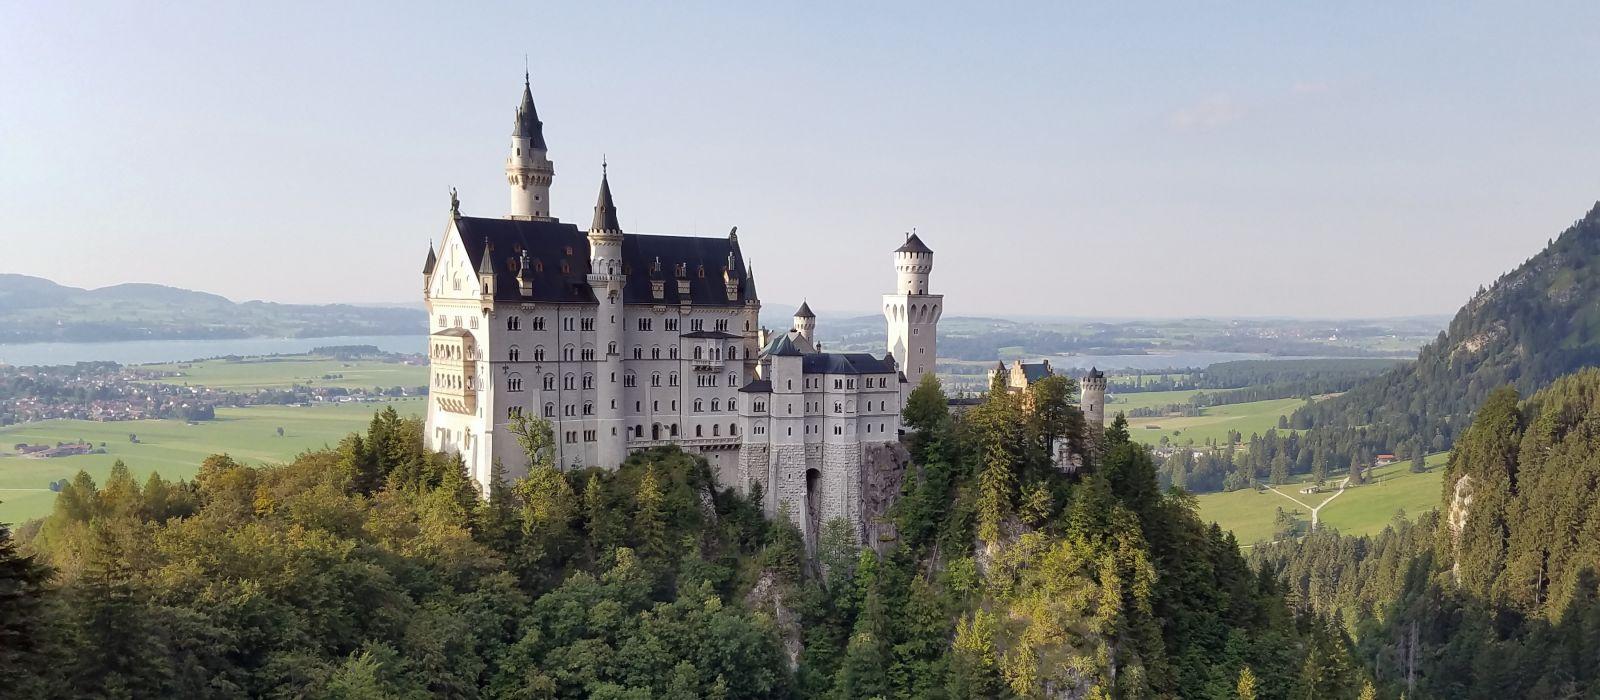 Famous Neuschwanstein Castle in Bavaria, Germany, Europe